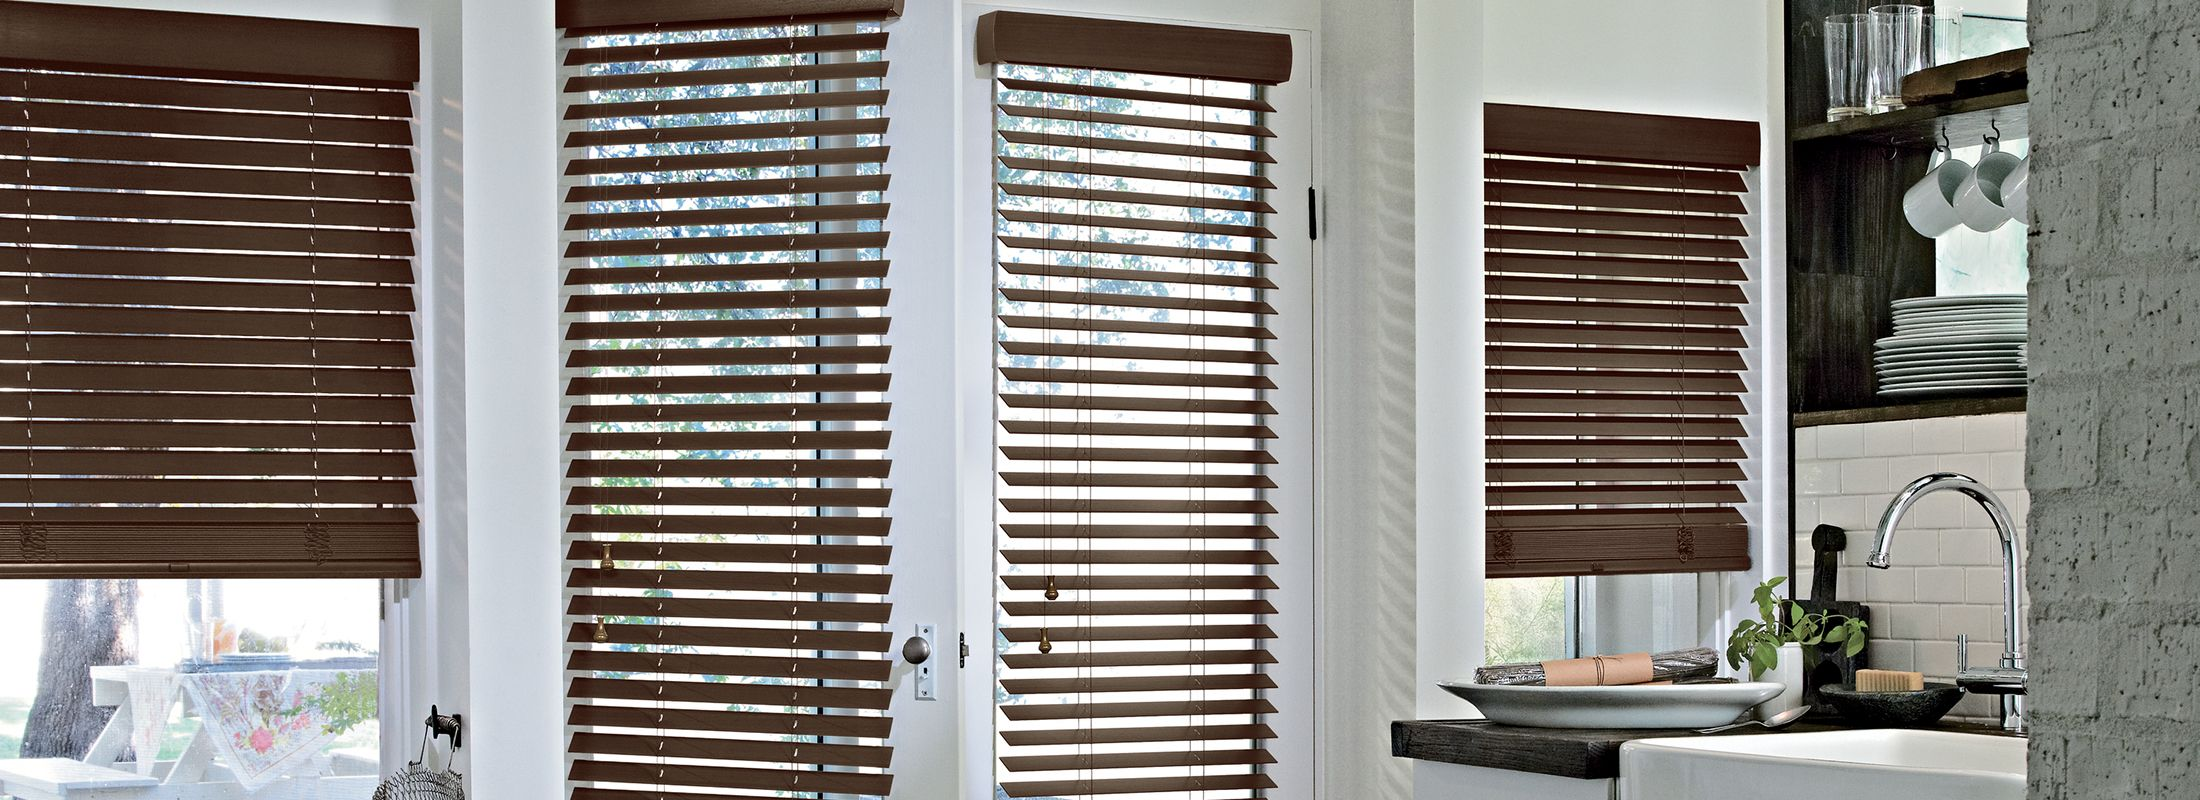 Parkland 174 Wood Blinds Peninsula Window Coverings